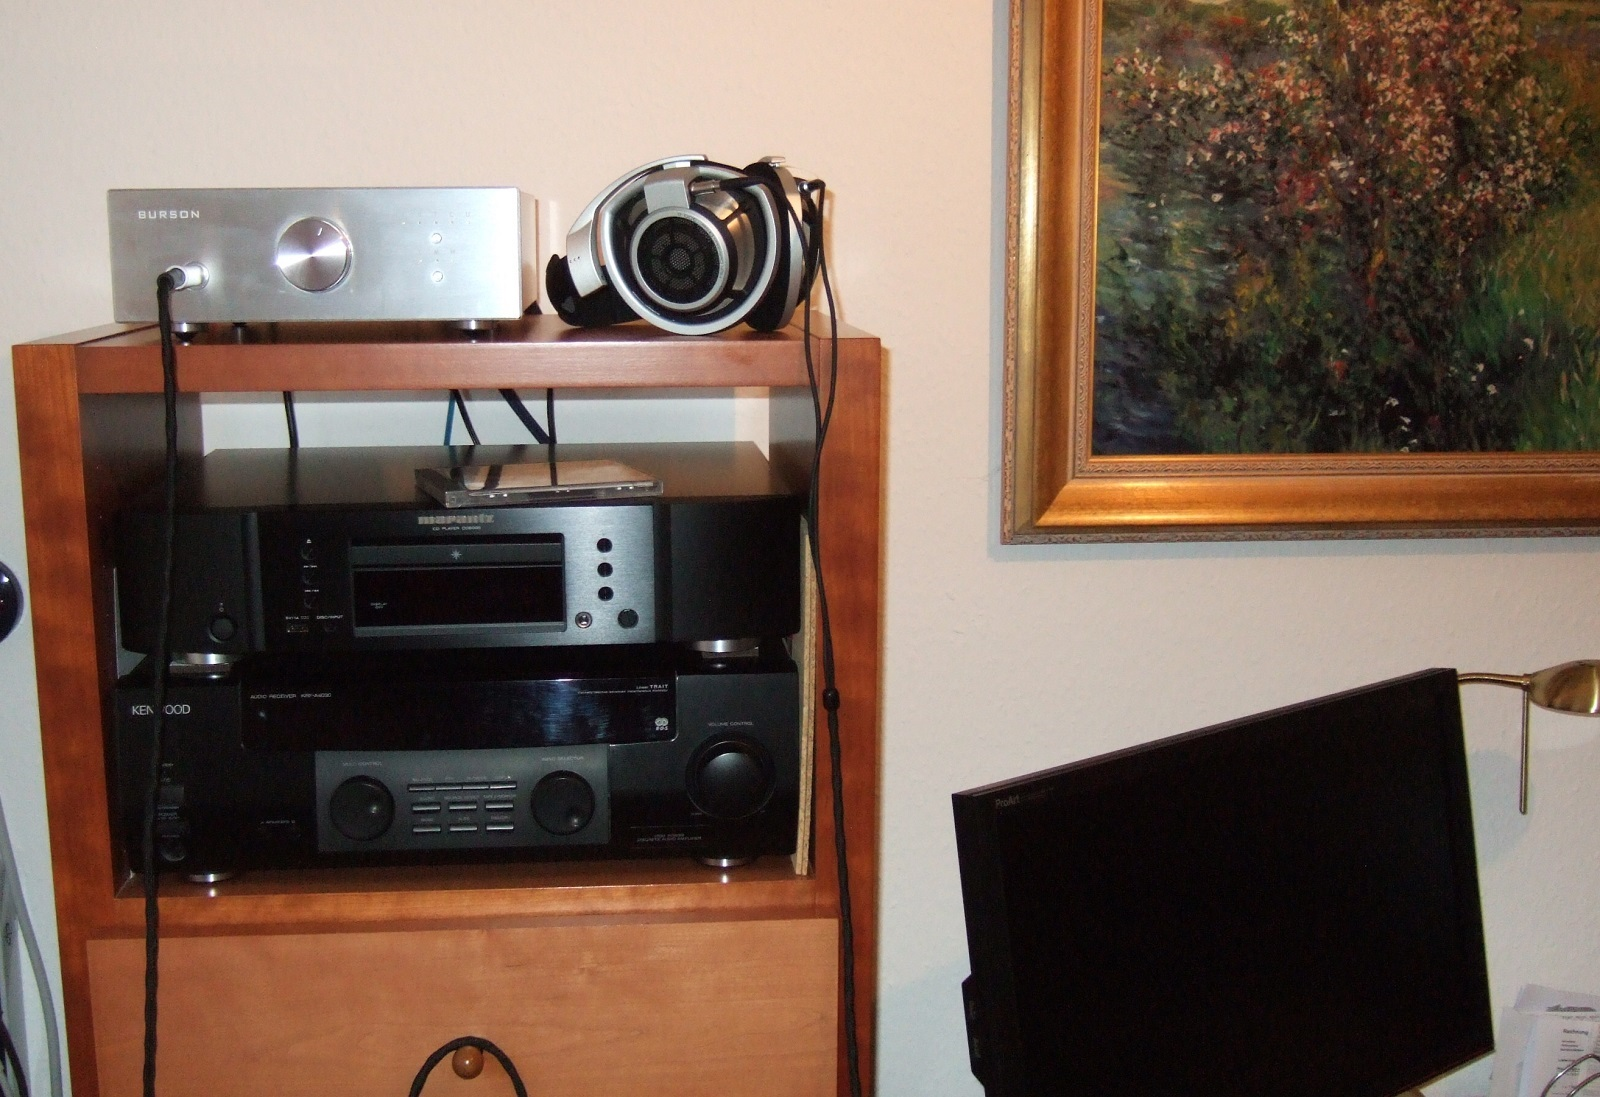 Sennheiser Hd800 Page 2 Burson Audio Hd 800 Dynamic Stereo Headphone With Conductor Amp Usb Dac